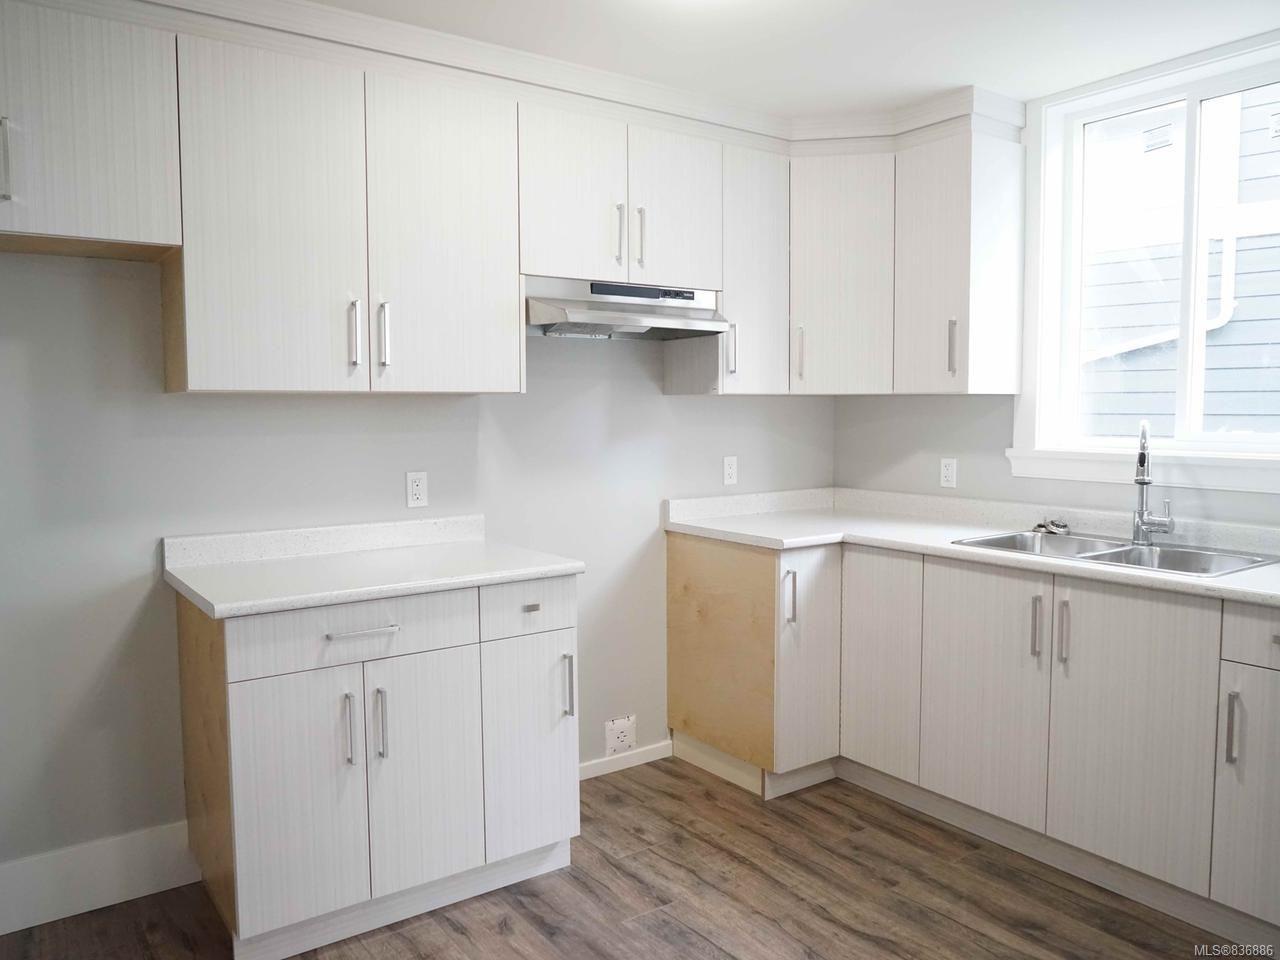 Photo 29: Photos: 123 Lindquist Rd in NANAIMO: Na North Nanaimo House for sale (Nanaimo)  : MLS®# 836886